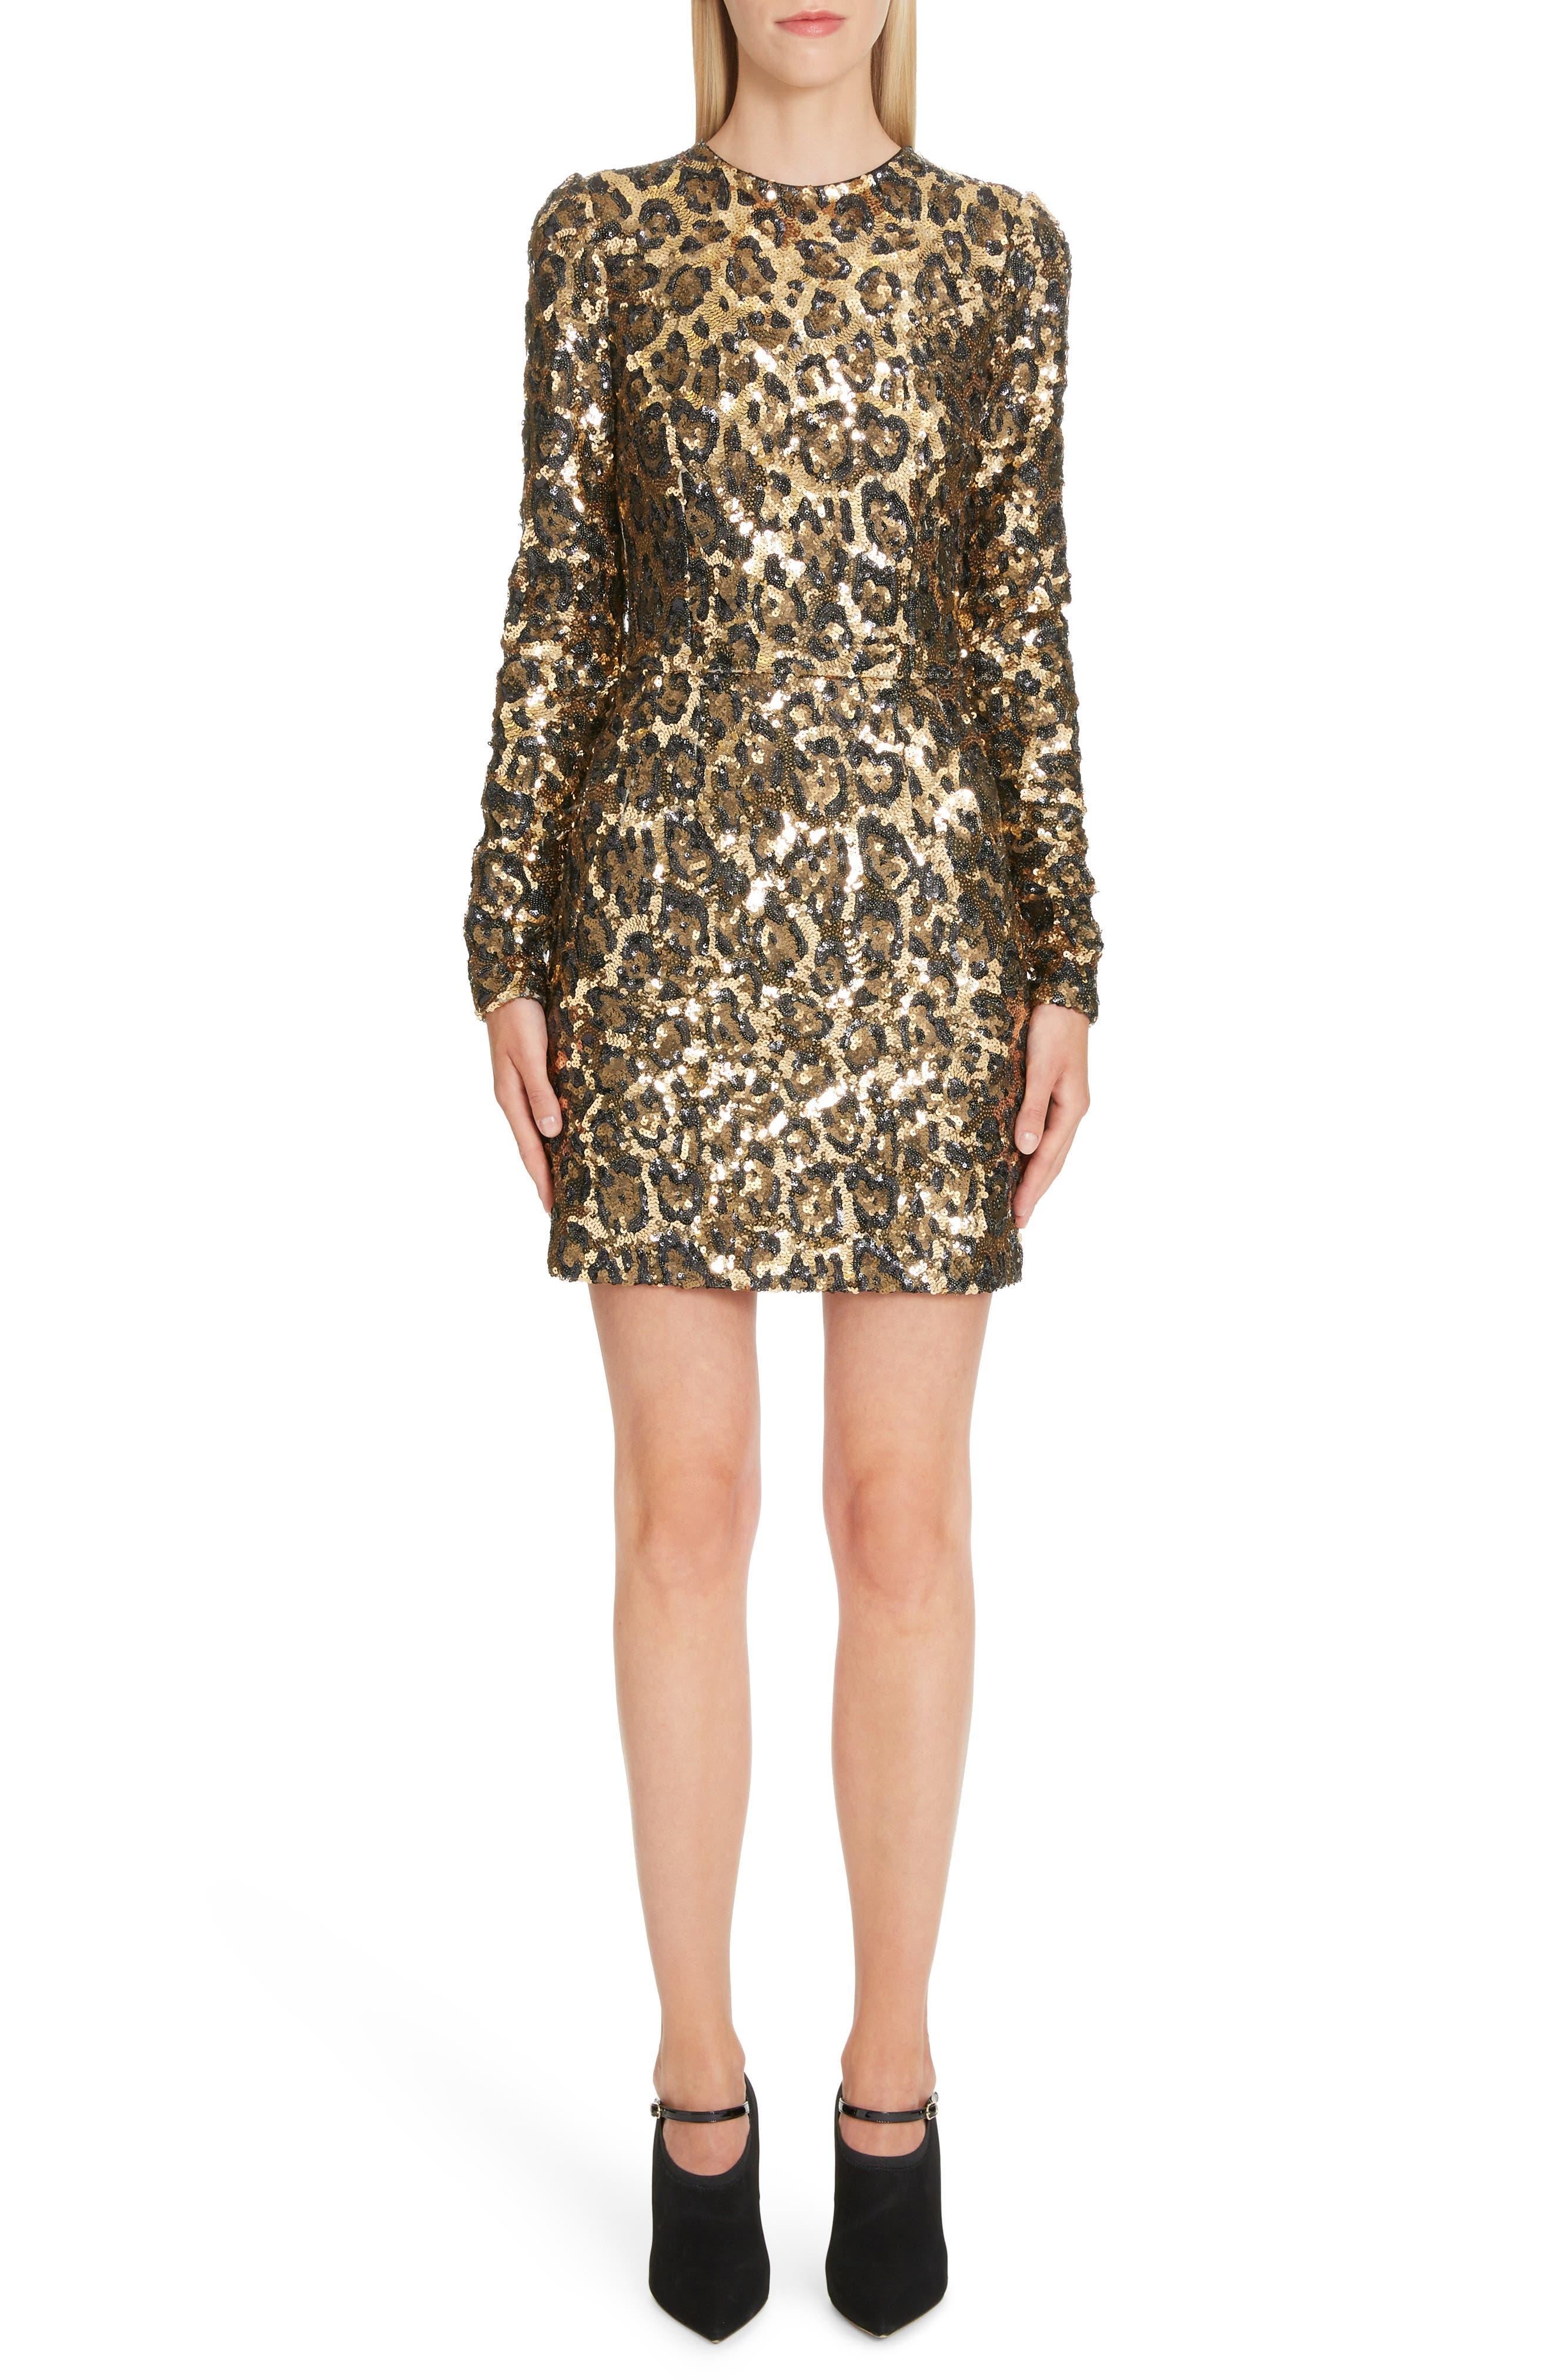 Sequin Leopard Print Sheath Dress,                             Main thumbnail 1, color,                             S0905 LEO